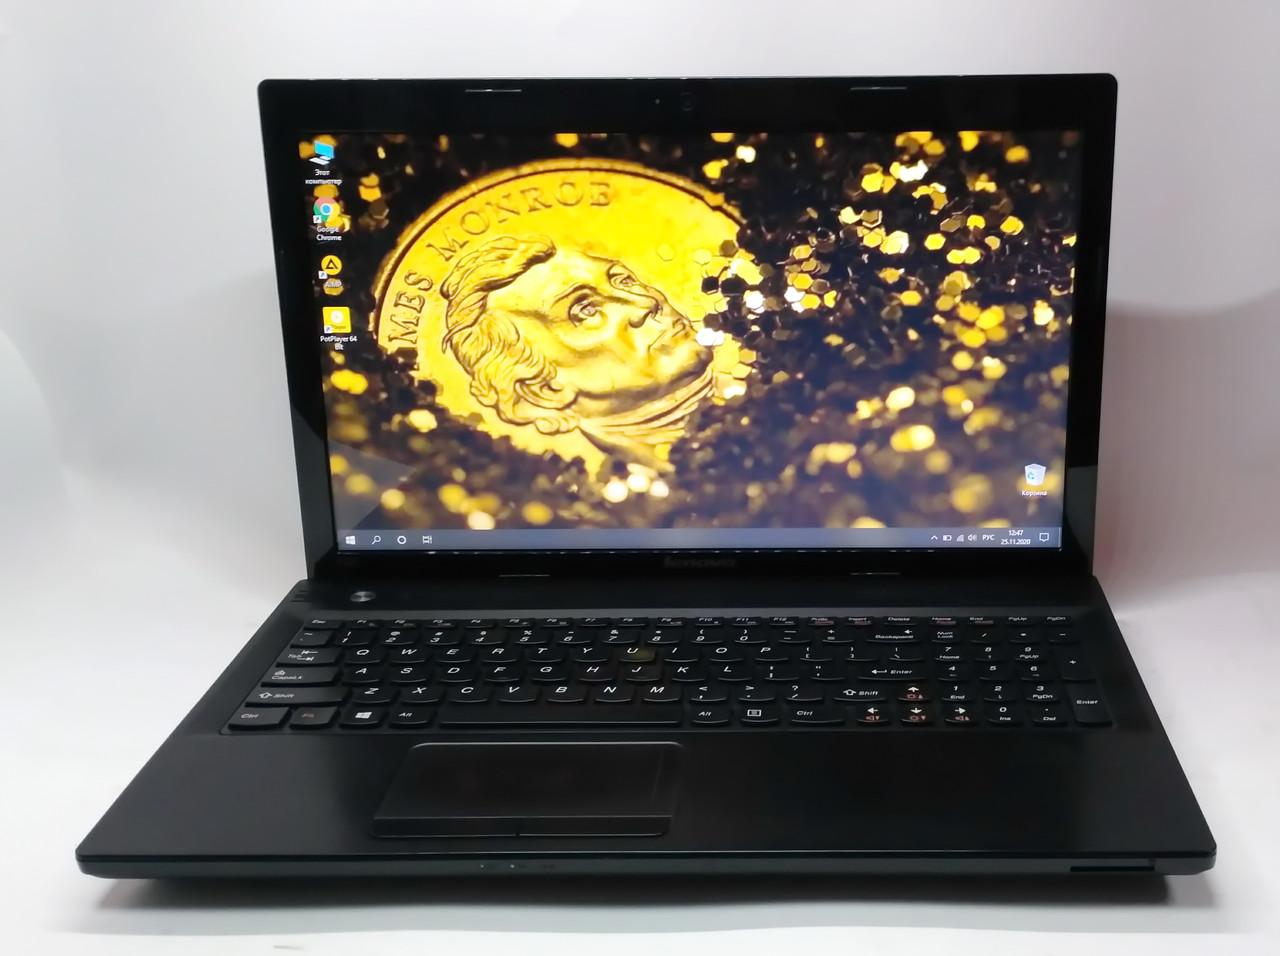 "Ноутбук Lenovo IdeaPad N580 15.6"" Intel Core i3-2310M 2.1 GHz 4 GB RAM 320 HDD Black Б/У"